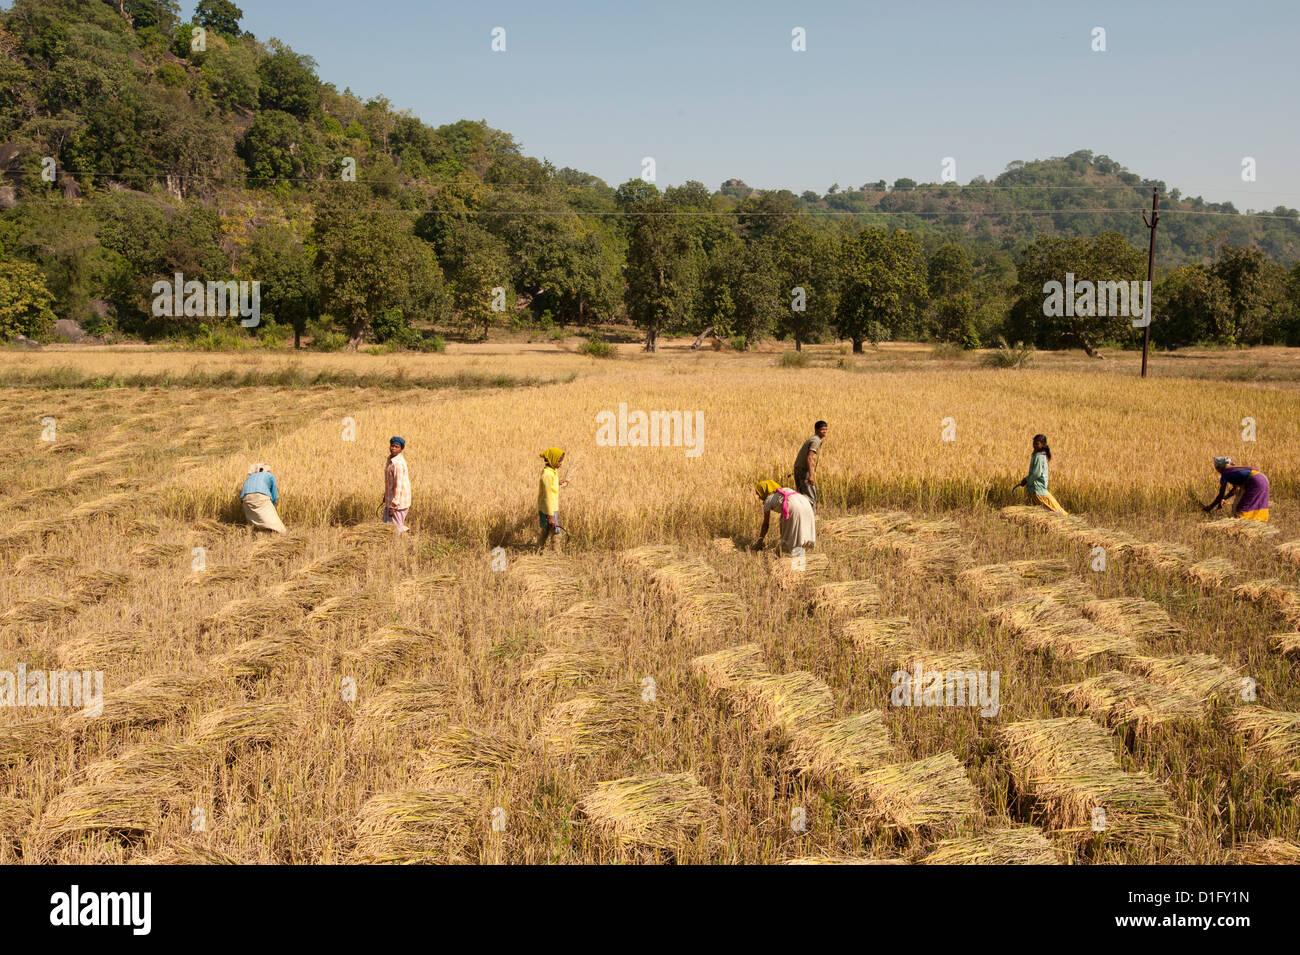 Villagers harvesting fields of rice, Orissa, India, Asia - Stock Image